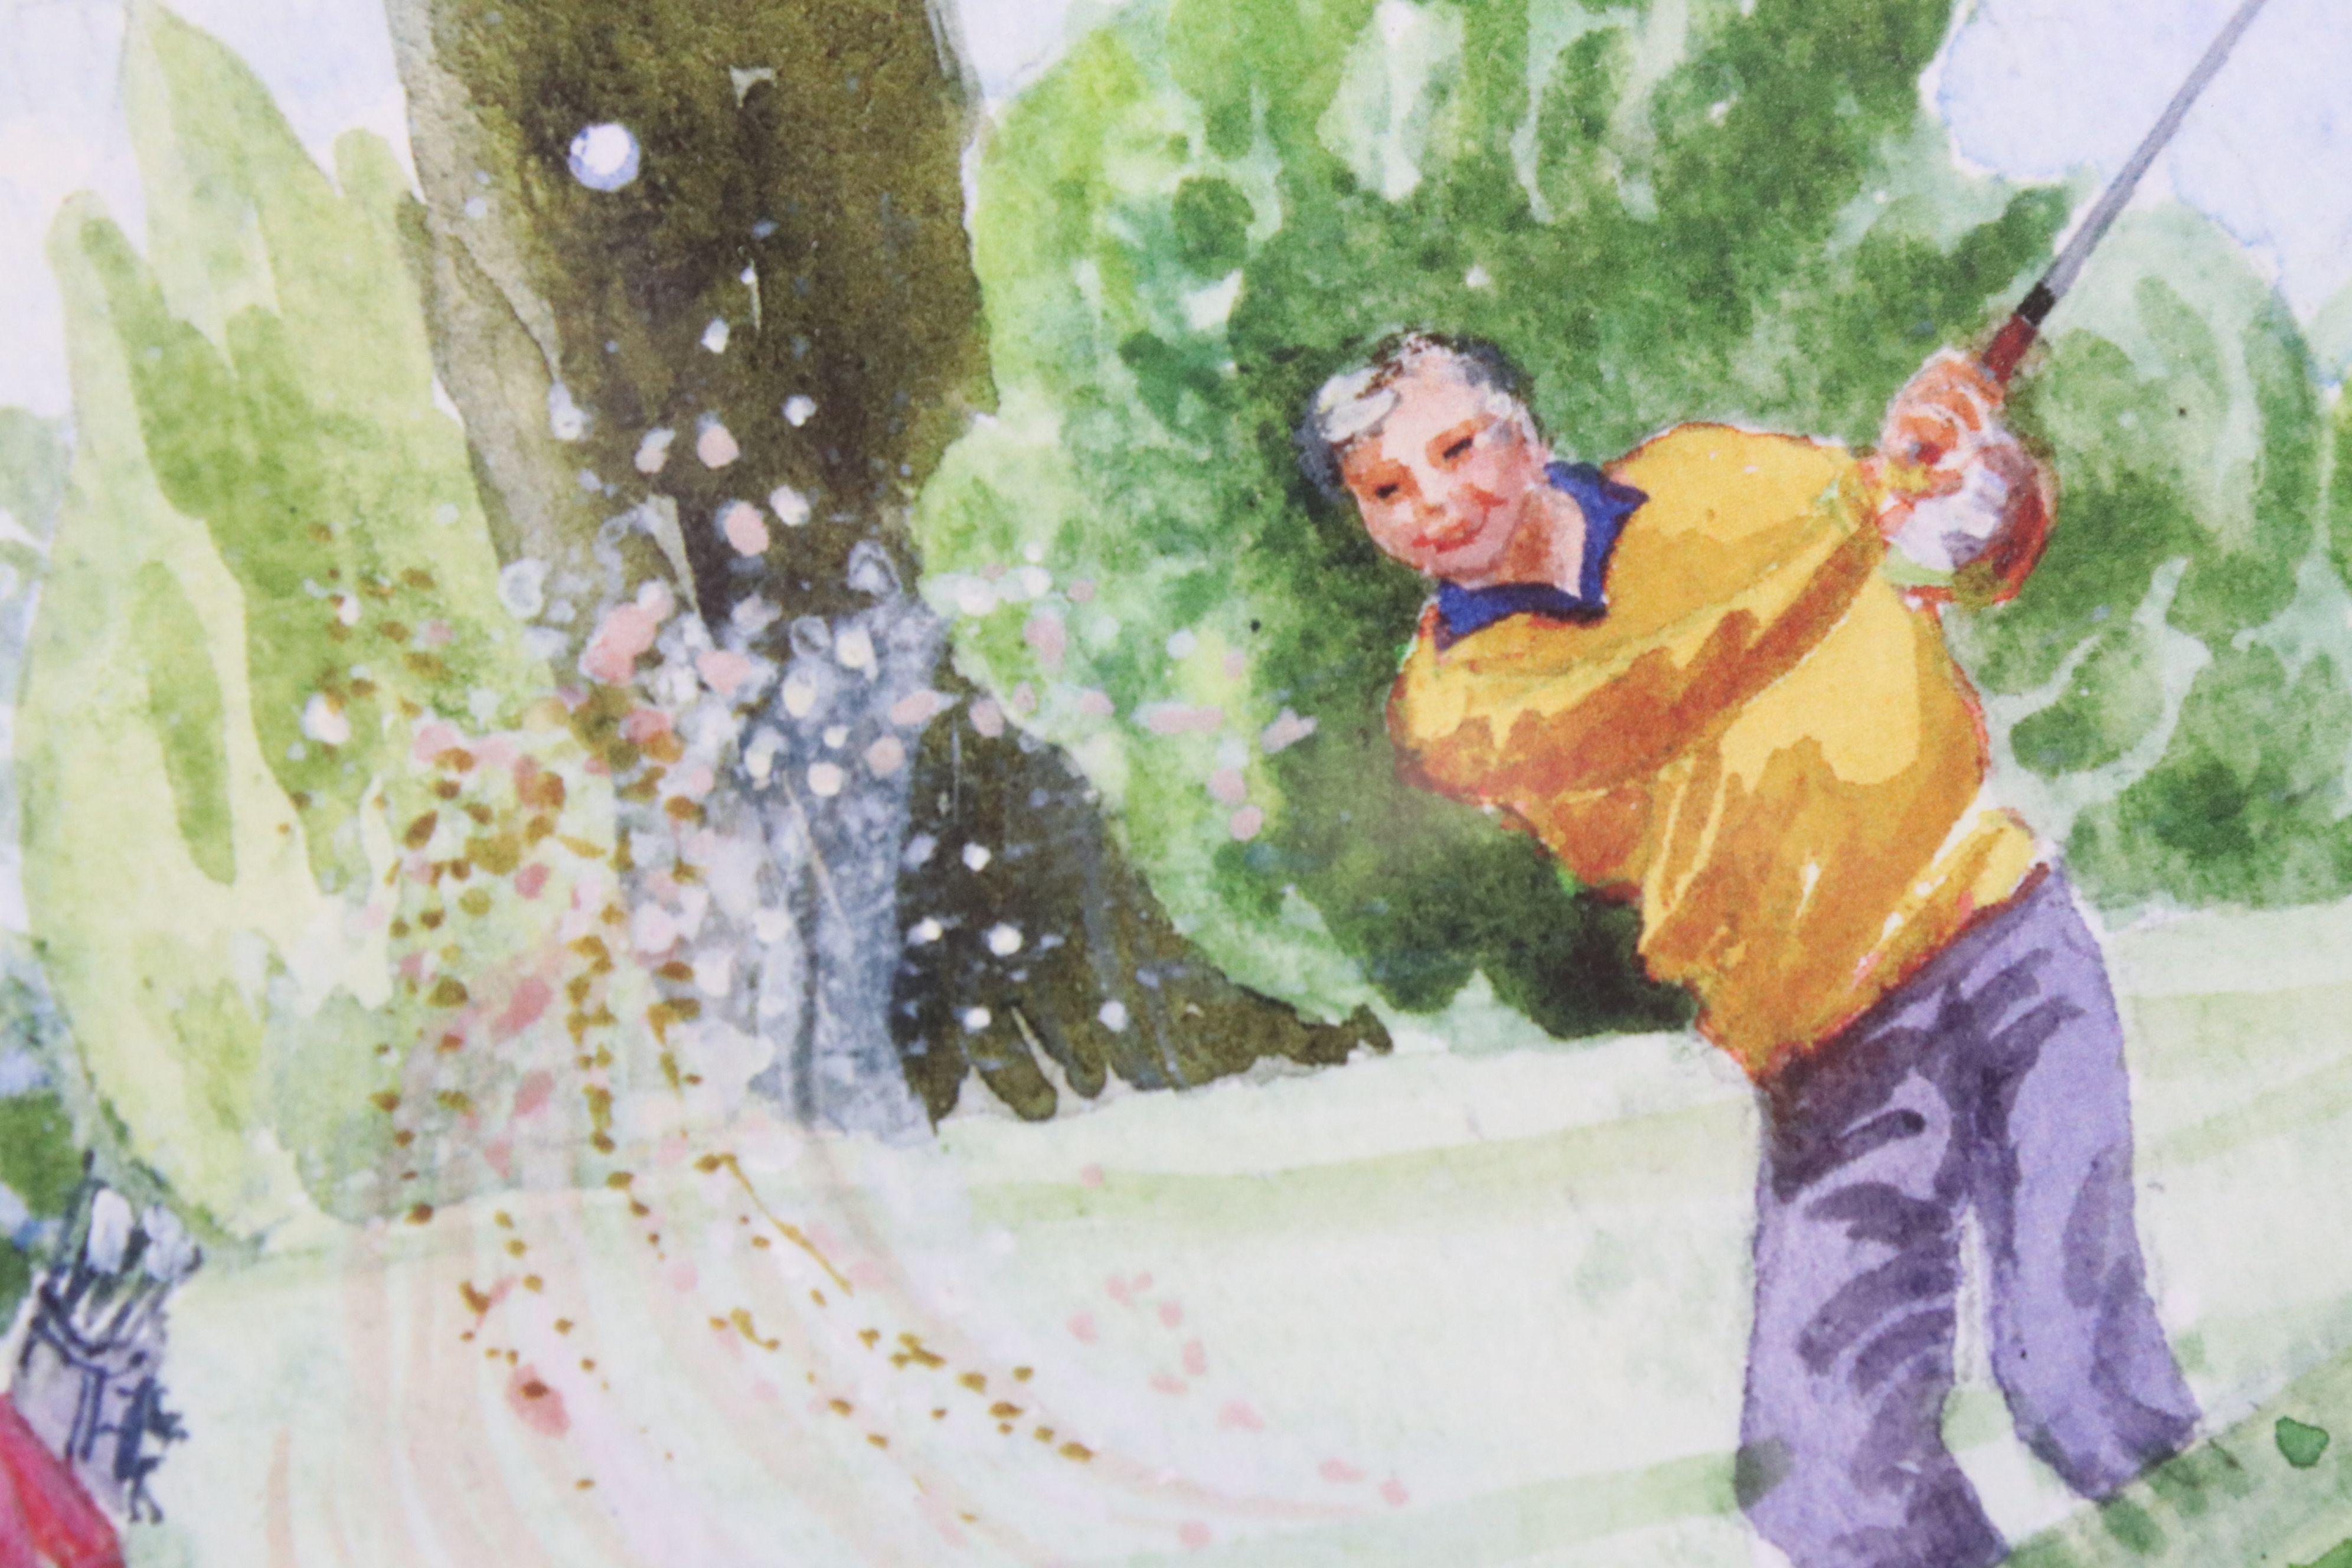 Tim Bulmer (cartoonist) a pair of humorous tennis watercolour cartoons & a signed Angela Fielder - Image 5 of 7